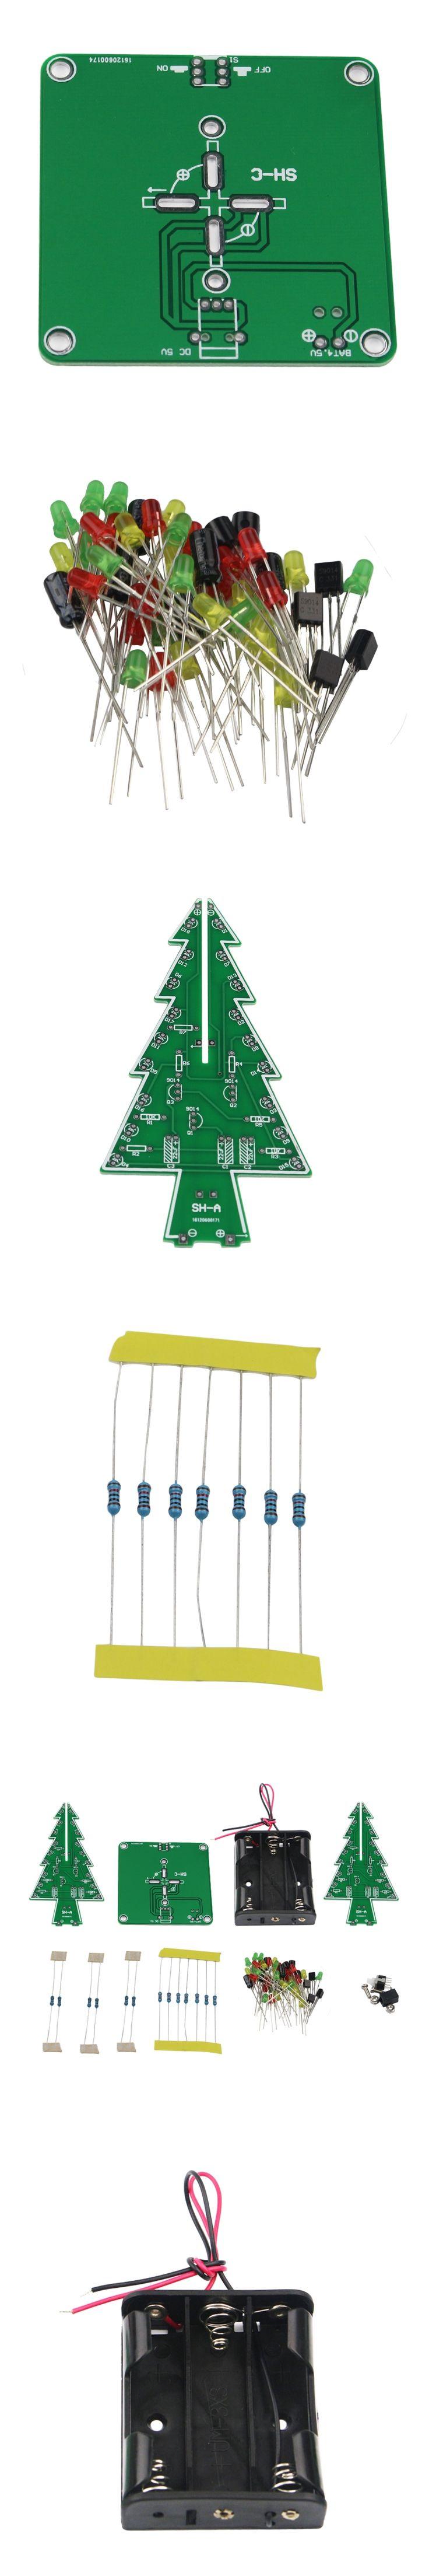 Christmas Tree LED Flashing Light DIY Light Board Kit Red Green Yellow Circuits For Christmas Decoration